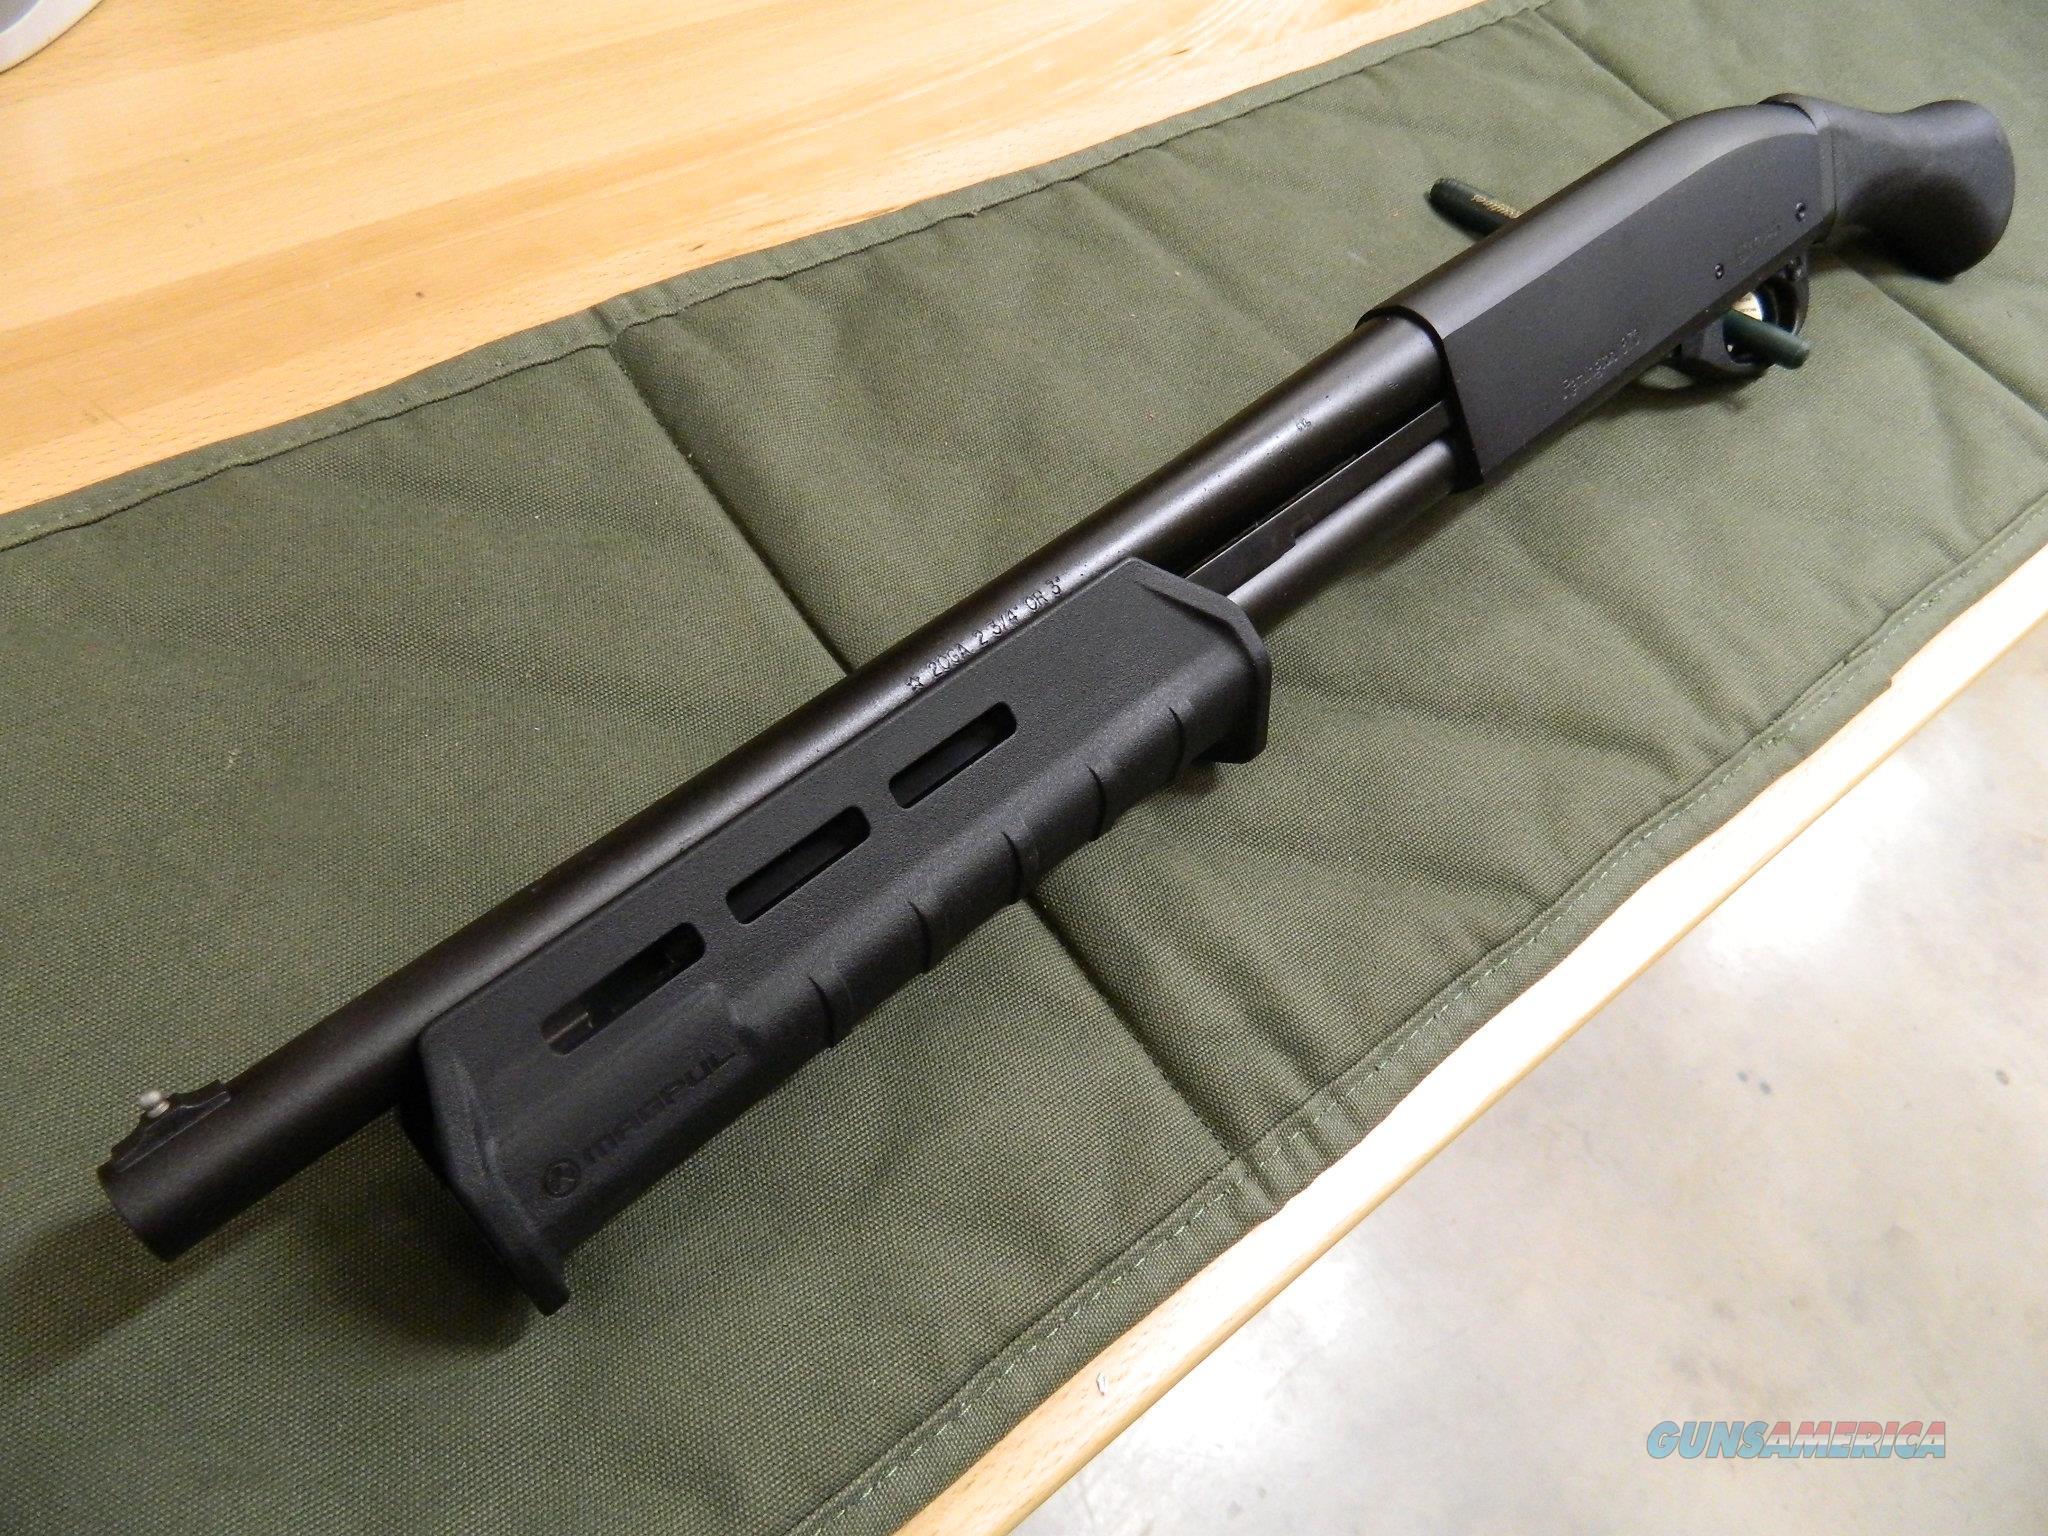 Remington 870 Tac-14 pump 20GA NIB  Guns > Shotguns > Remington Shotguns  > Pump > Tactical